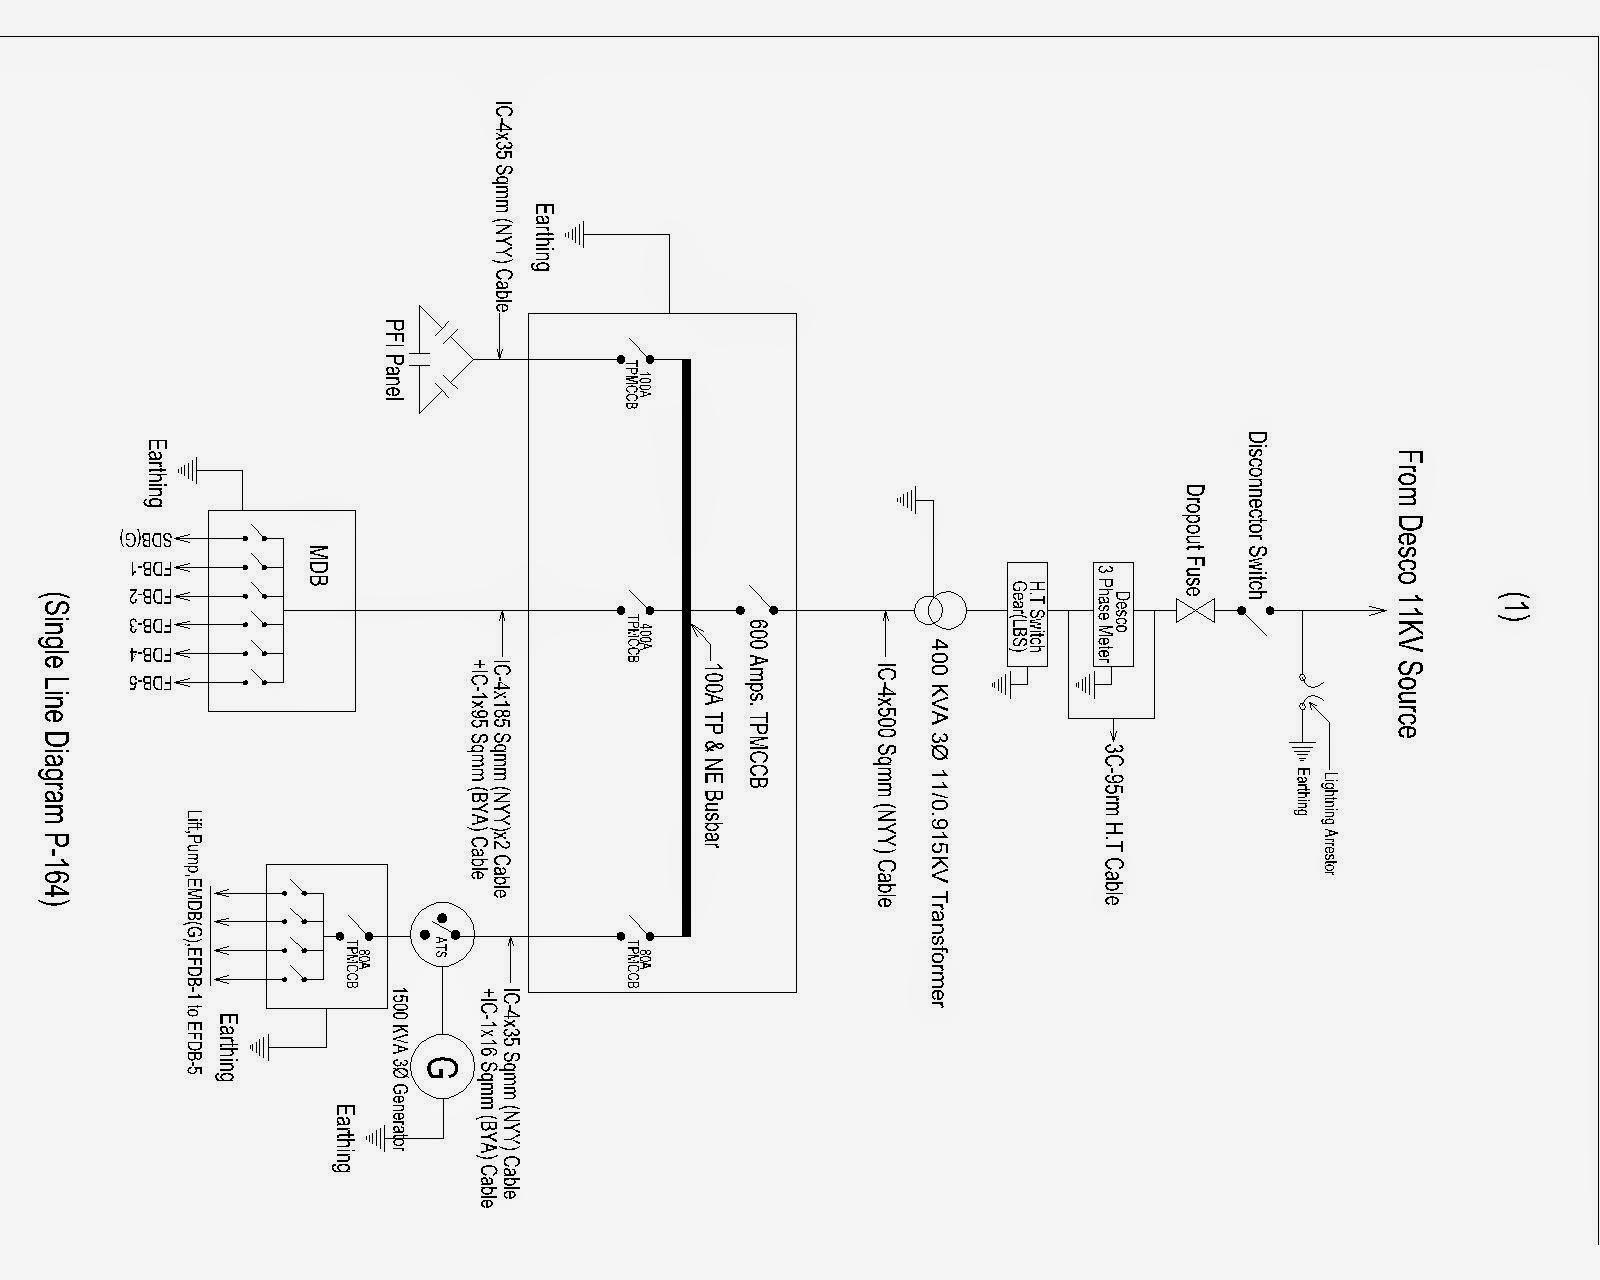 hight resolution of penerangan gambar single line wiring diagram free vehicle wiring 3 phase convection oven wiring diagram 3